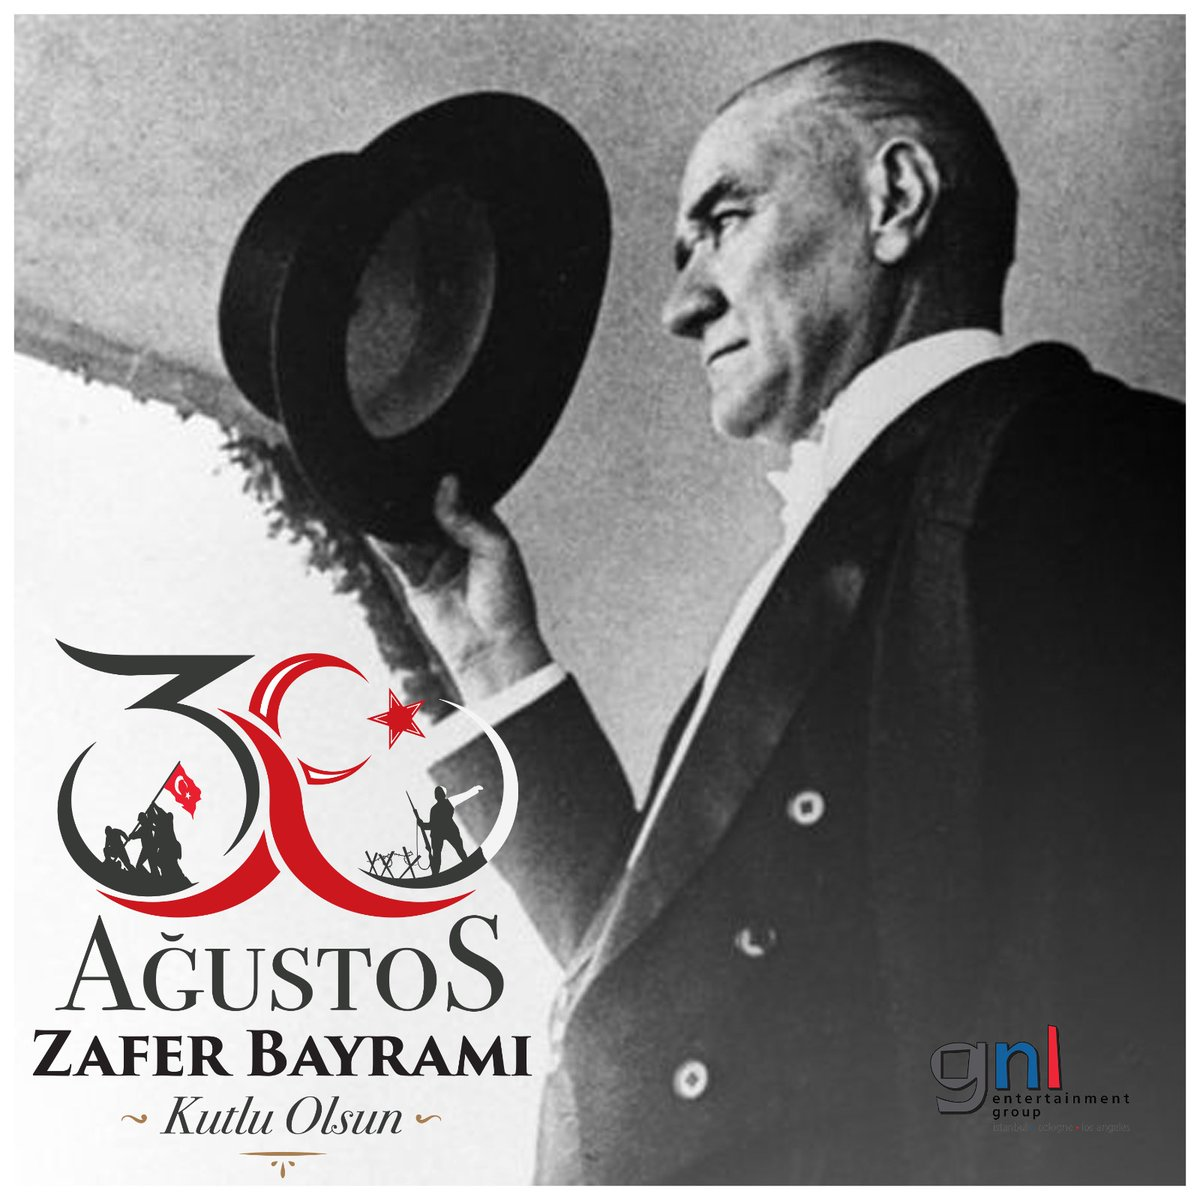 30 Ağustos Zafer Bayramımız Kutlu Olsun! 💫 #30Agustos https://t.co/c2rWJaDUmK